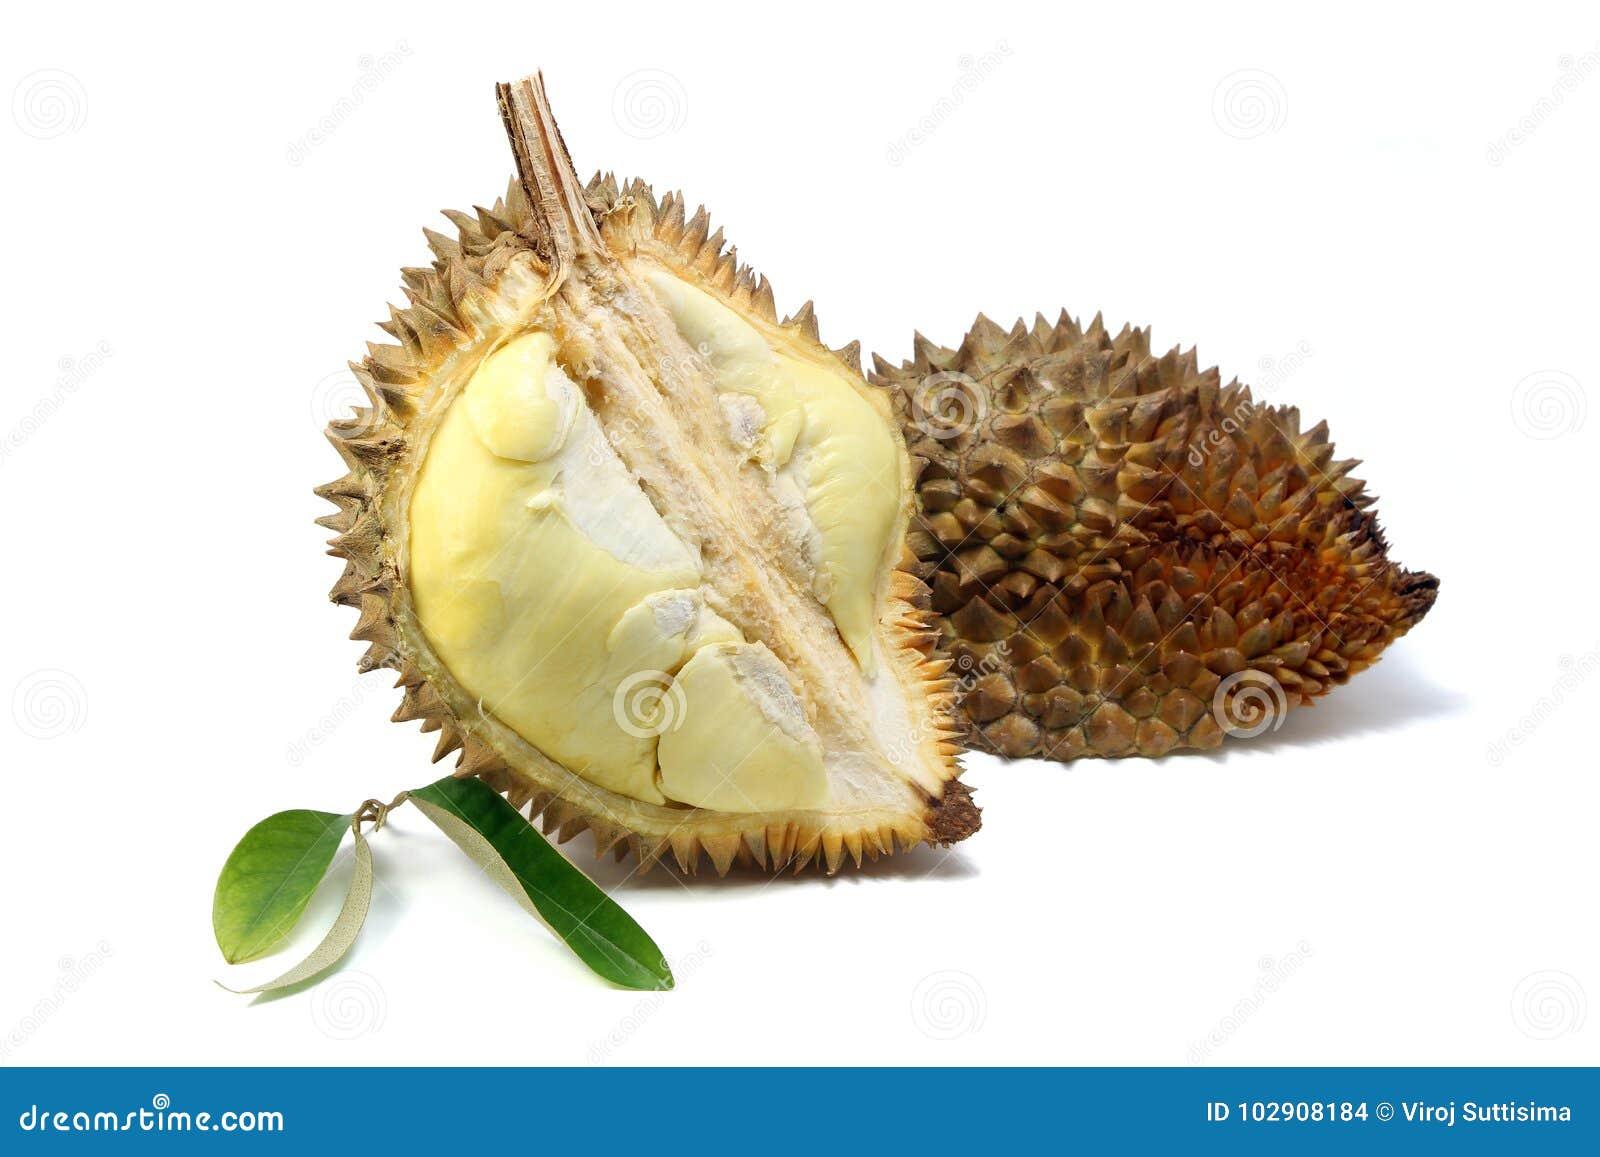 Geel vlees van Durian en Durian-blad op witte achtergrond